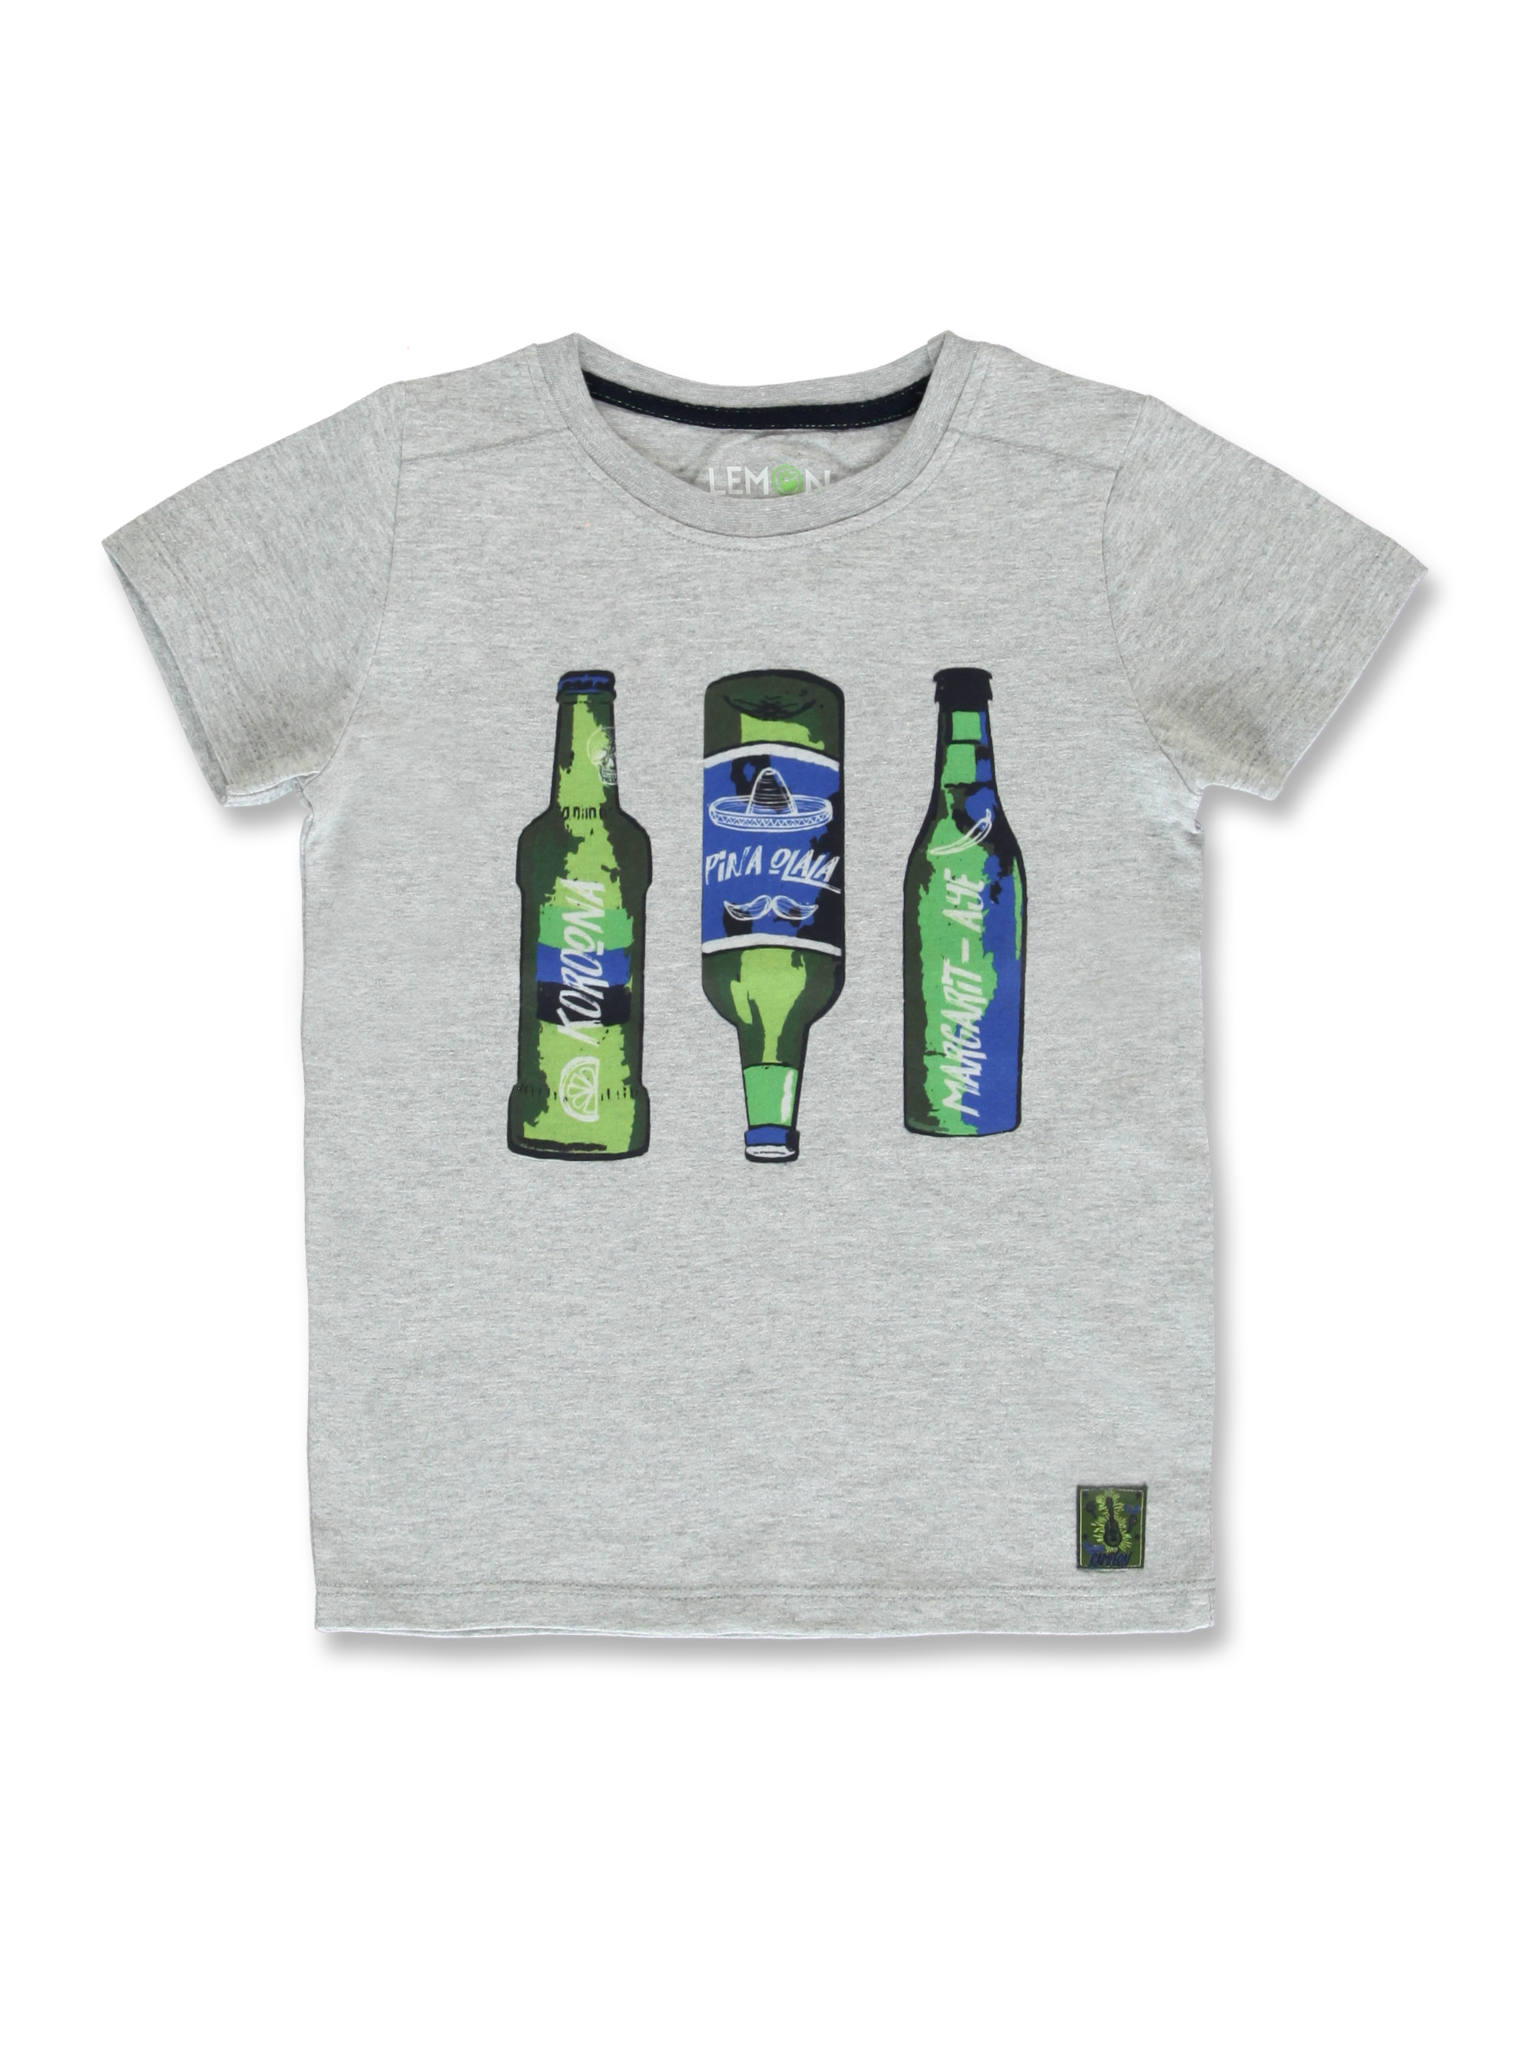 All Brands   Summerproducts Small Boys   T-shirt   12 pcs/box